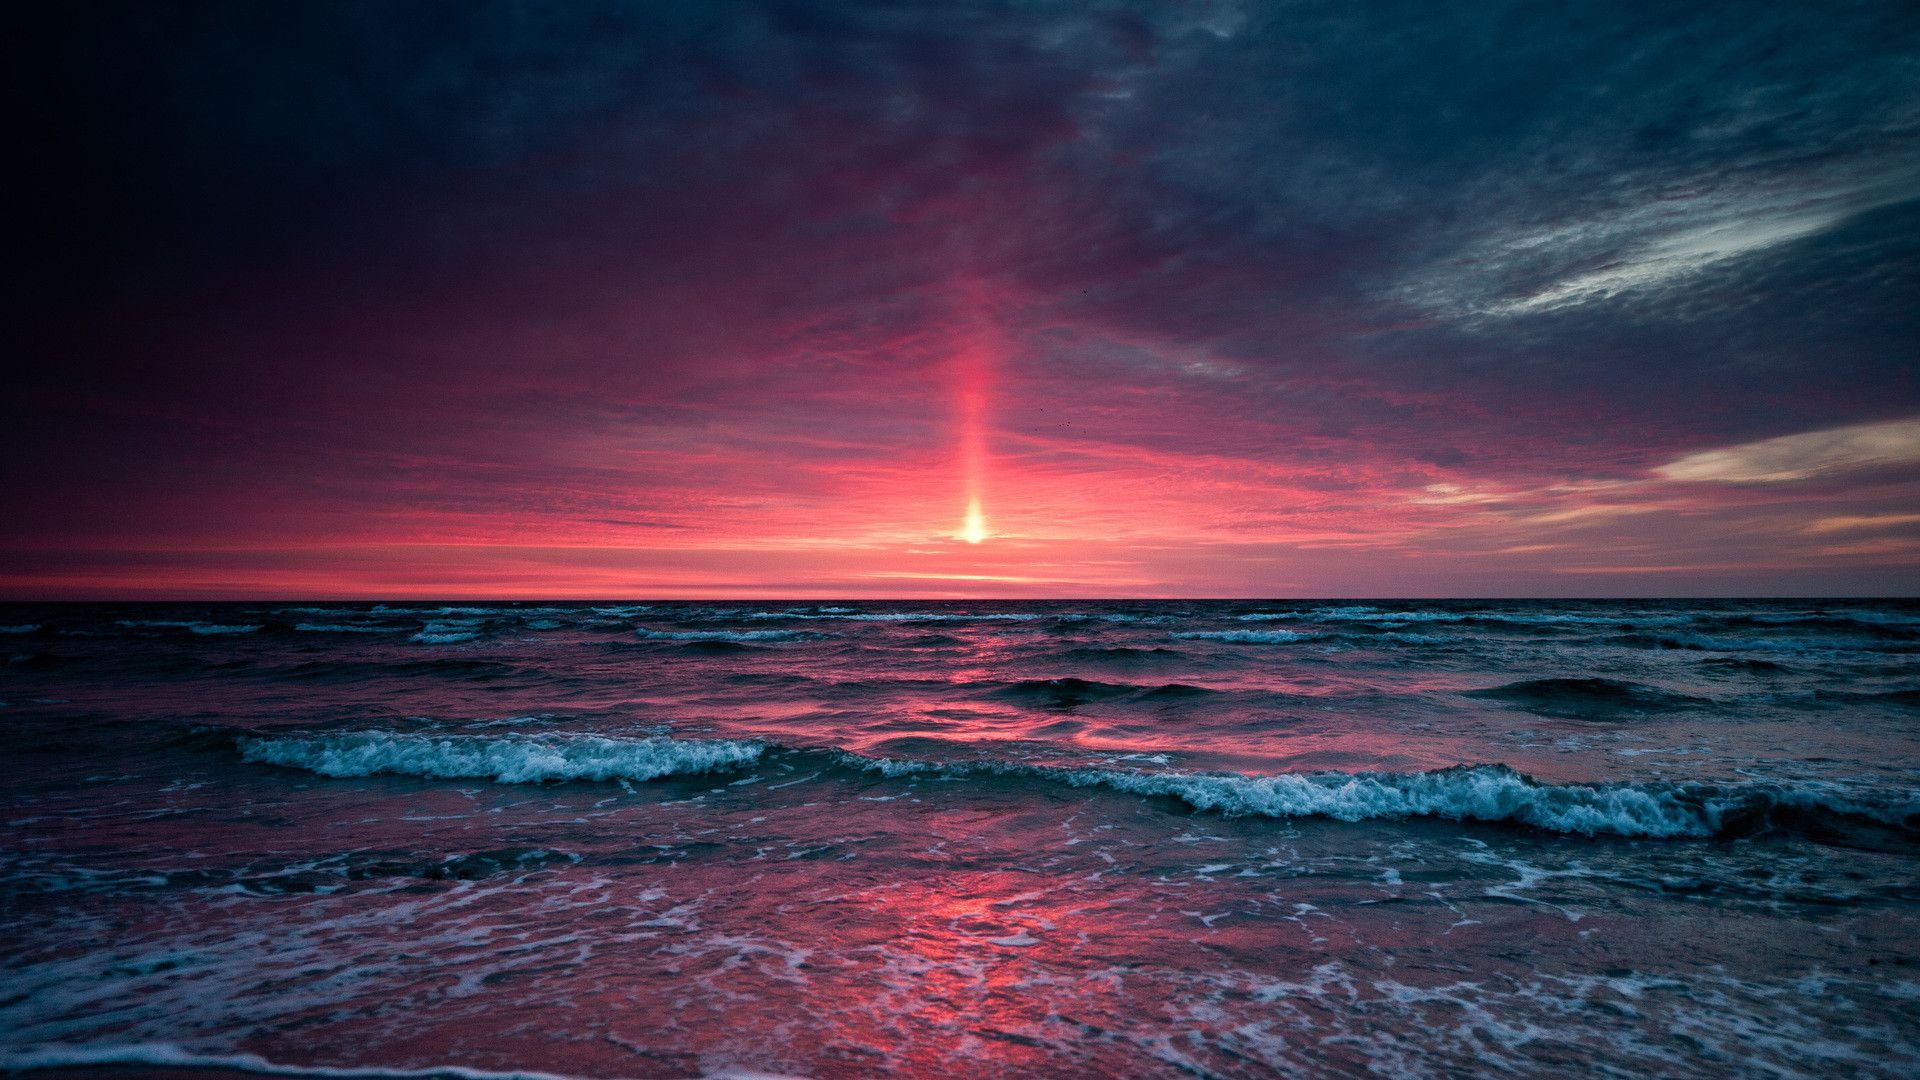 Ocean Sunset hd wallpaper download